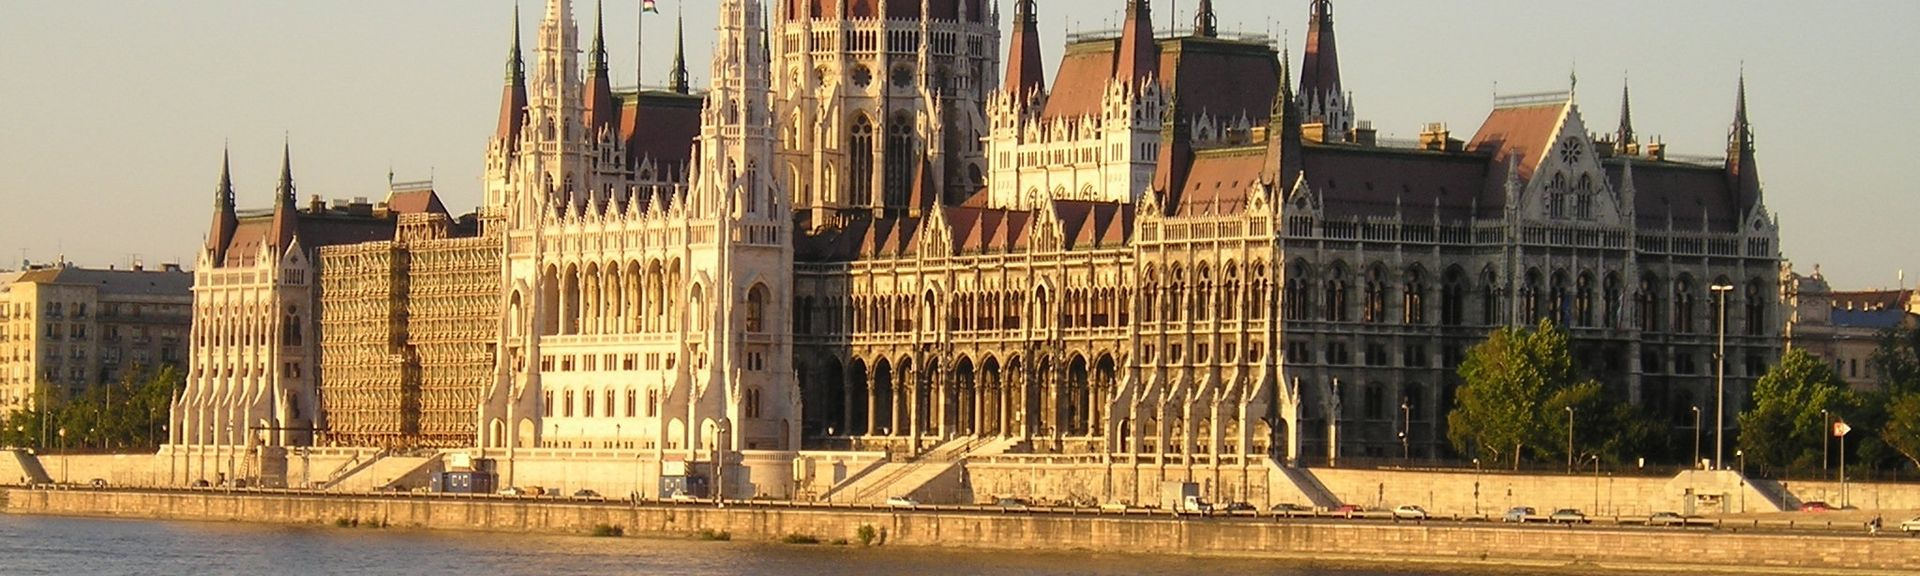 Dunakeszi, Provincia di Pest, Ungheria